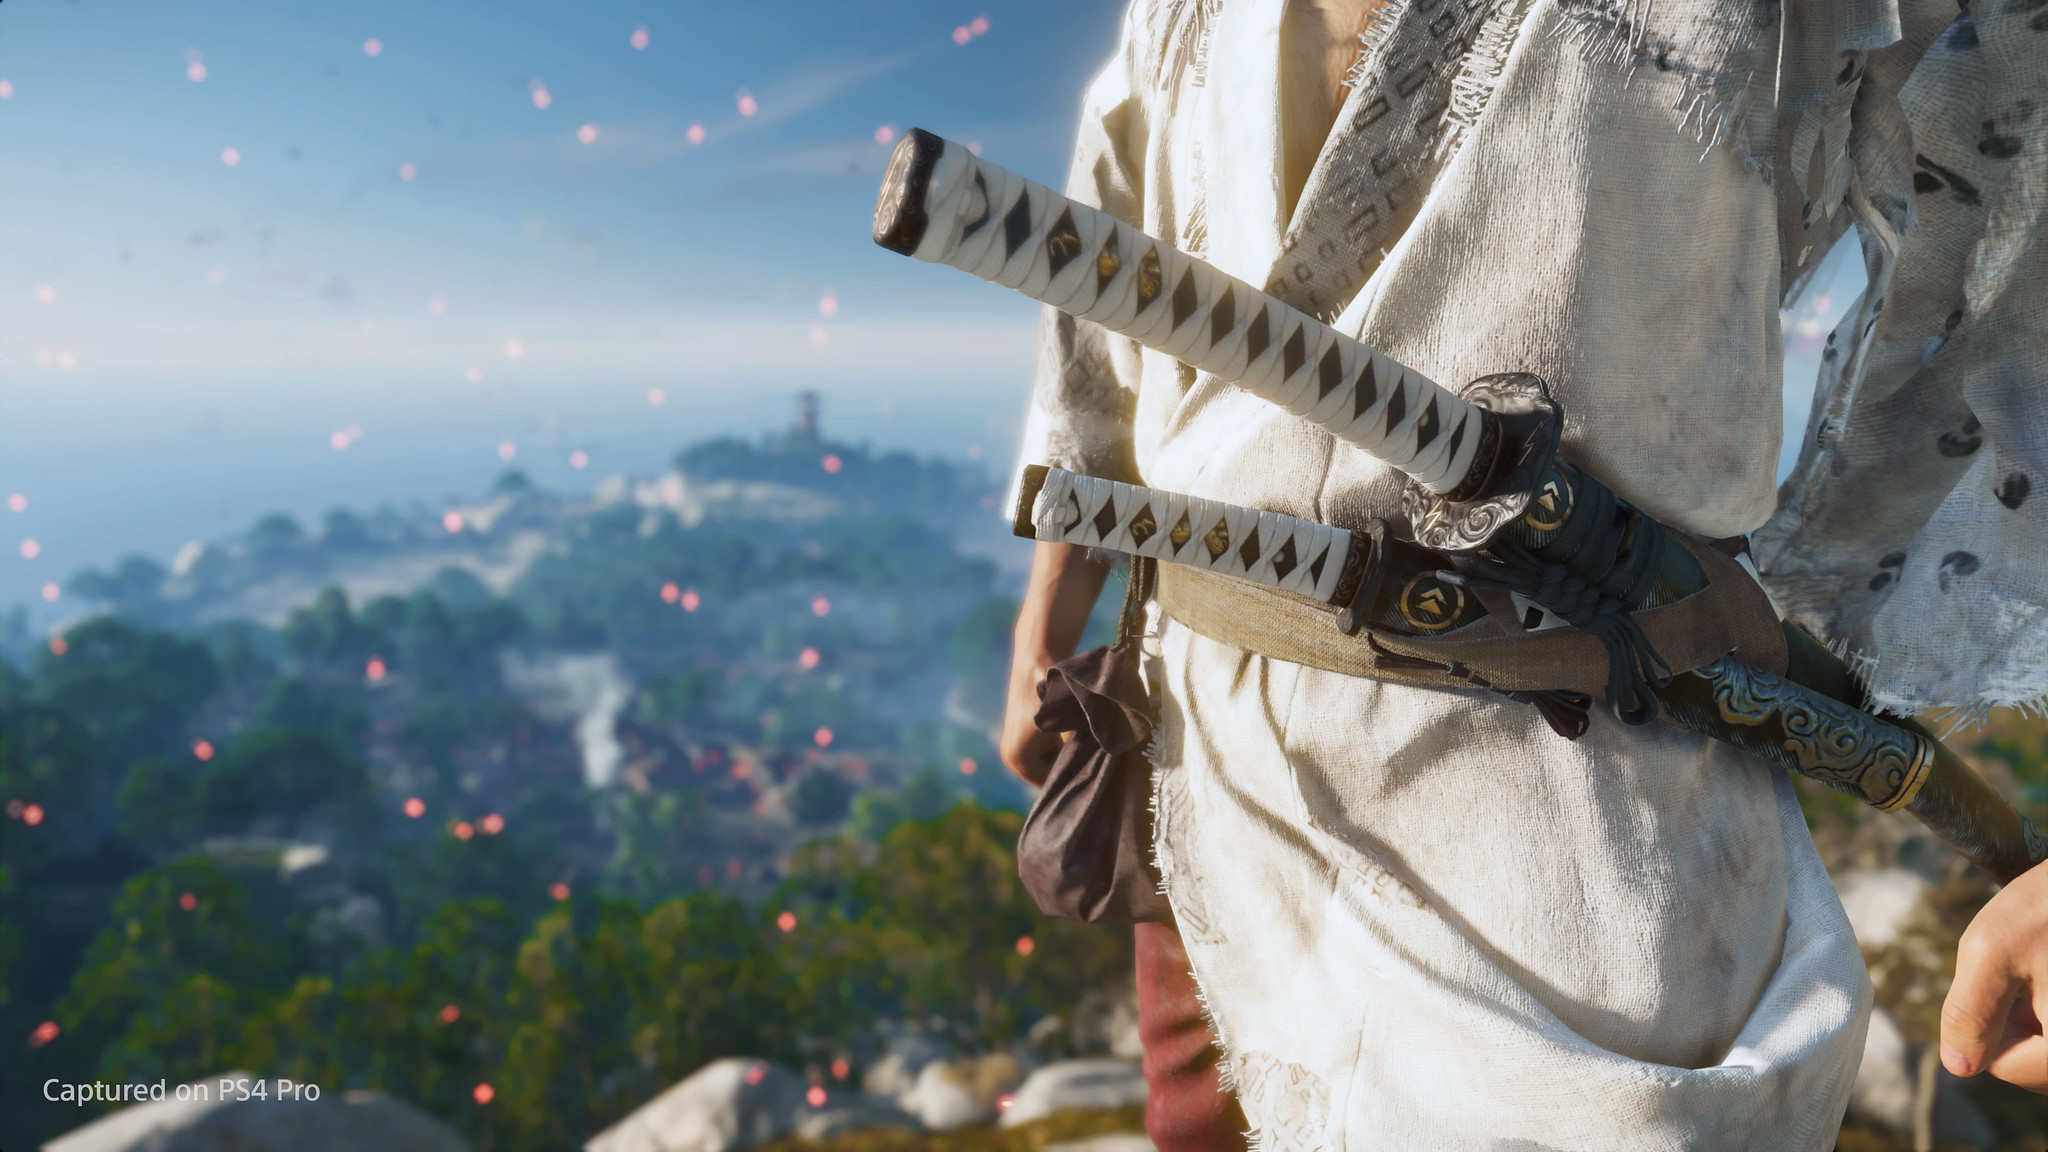 Ghost of Tsushima Jin's swords